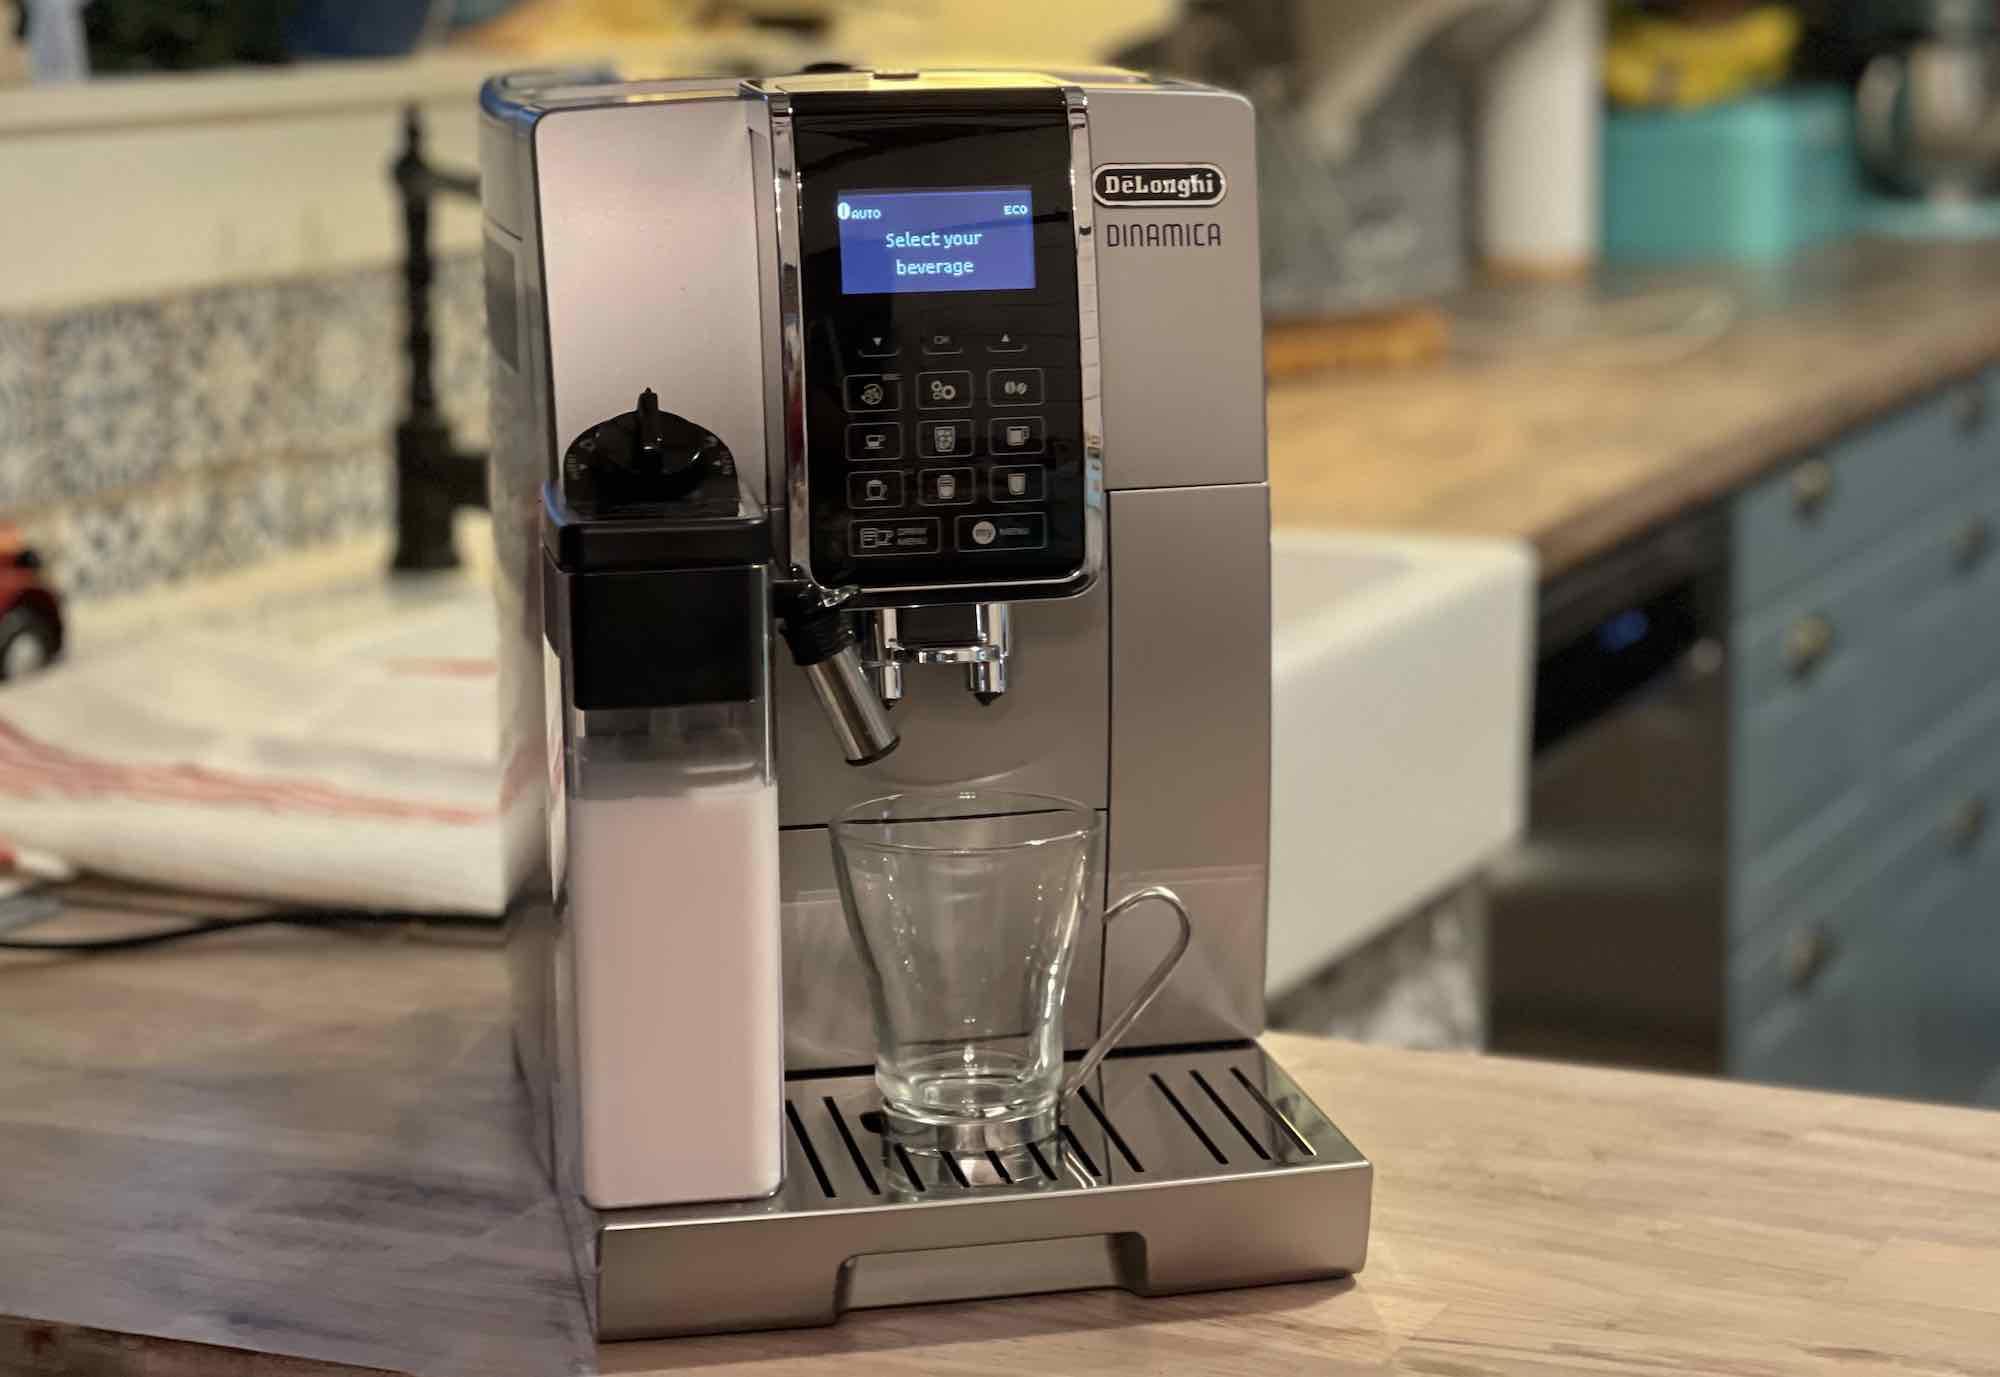 De'Longhi Dinamica Automatic Espresso Machine with LatteCrema Milk Frother Review